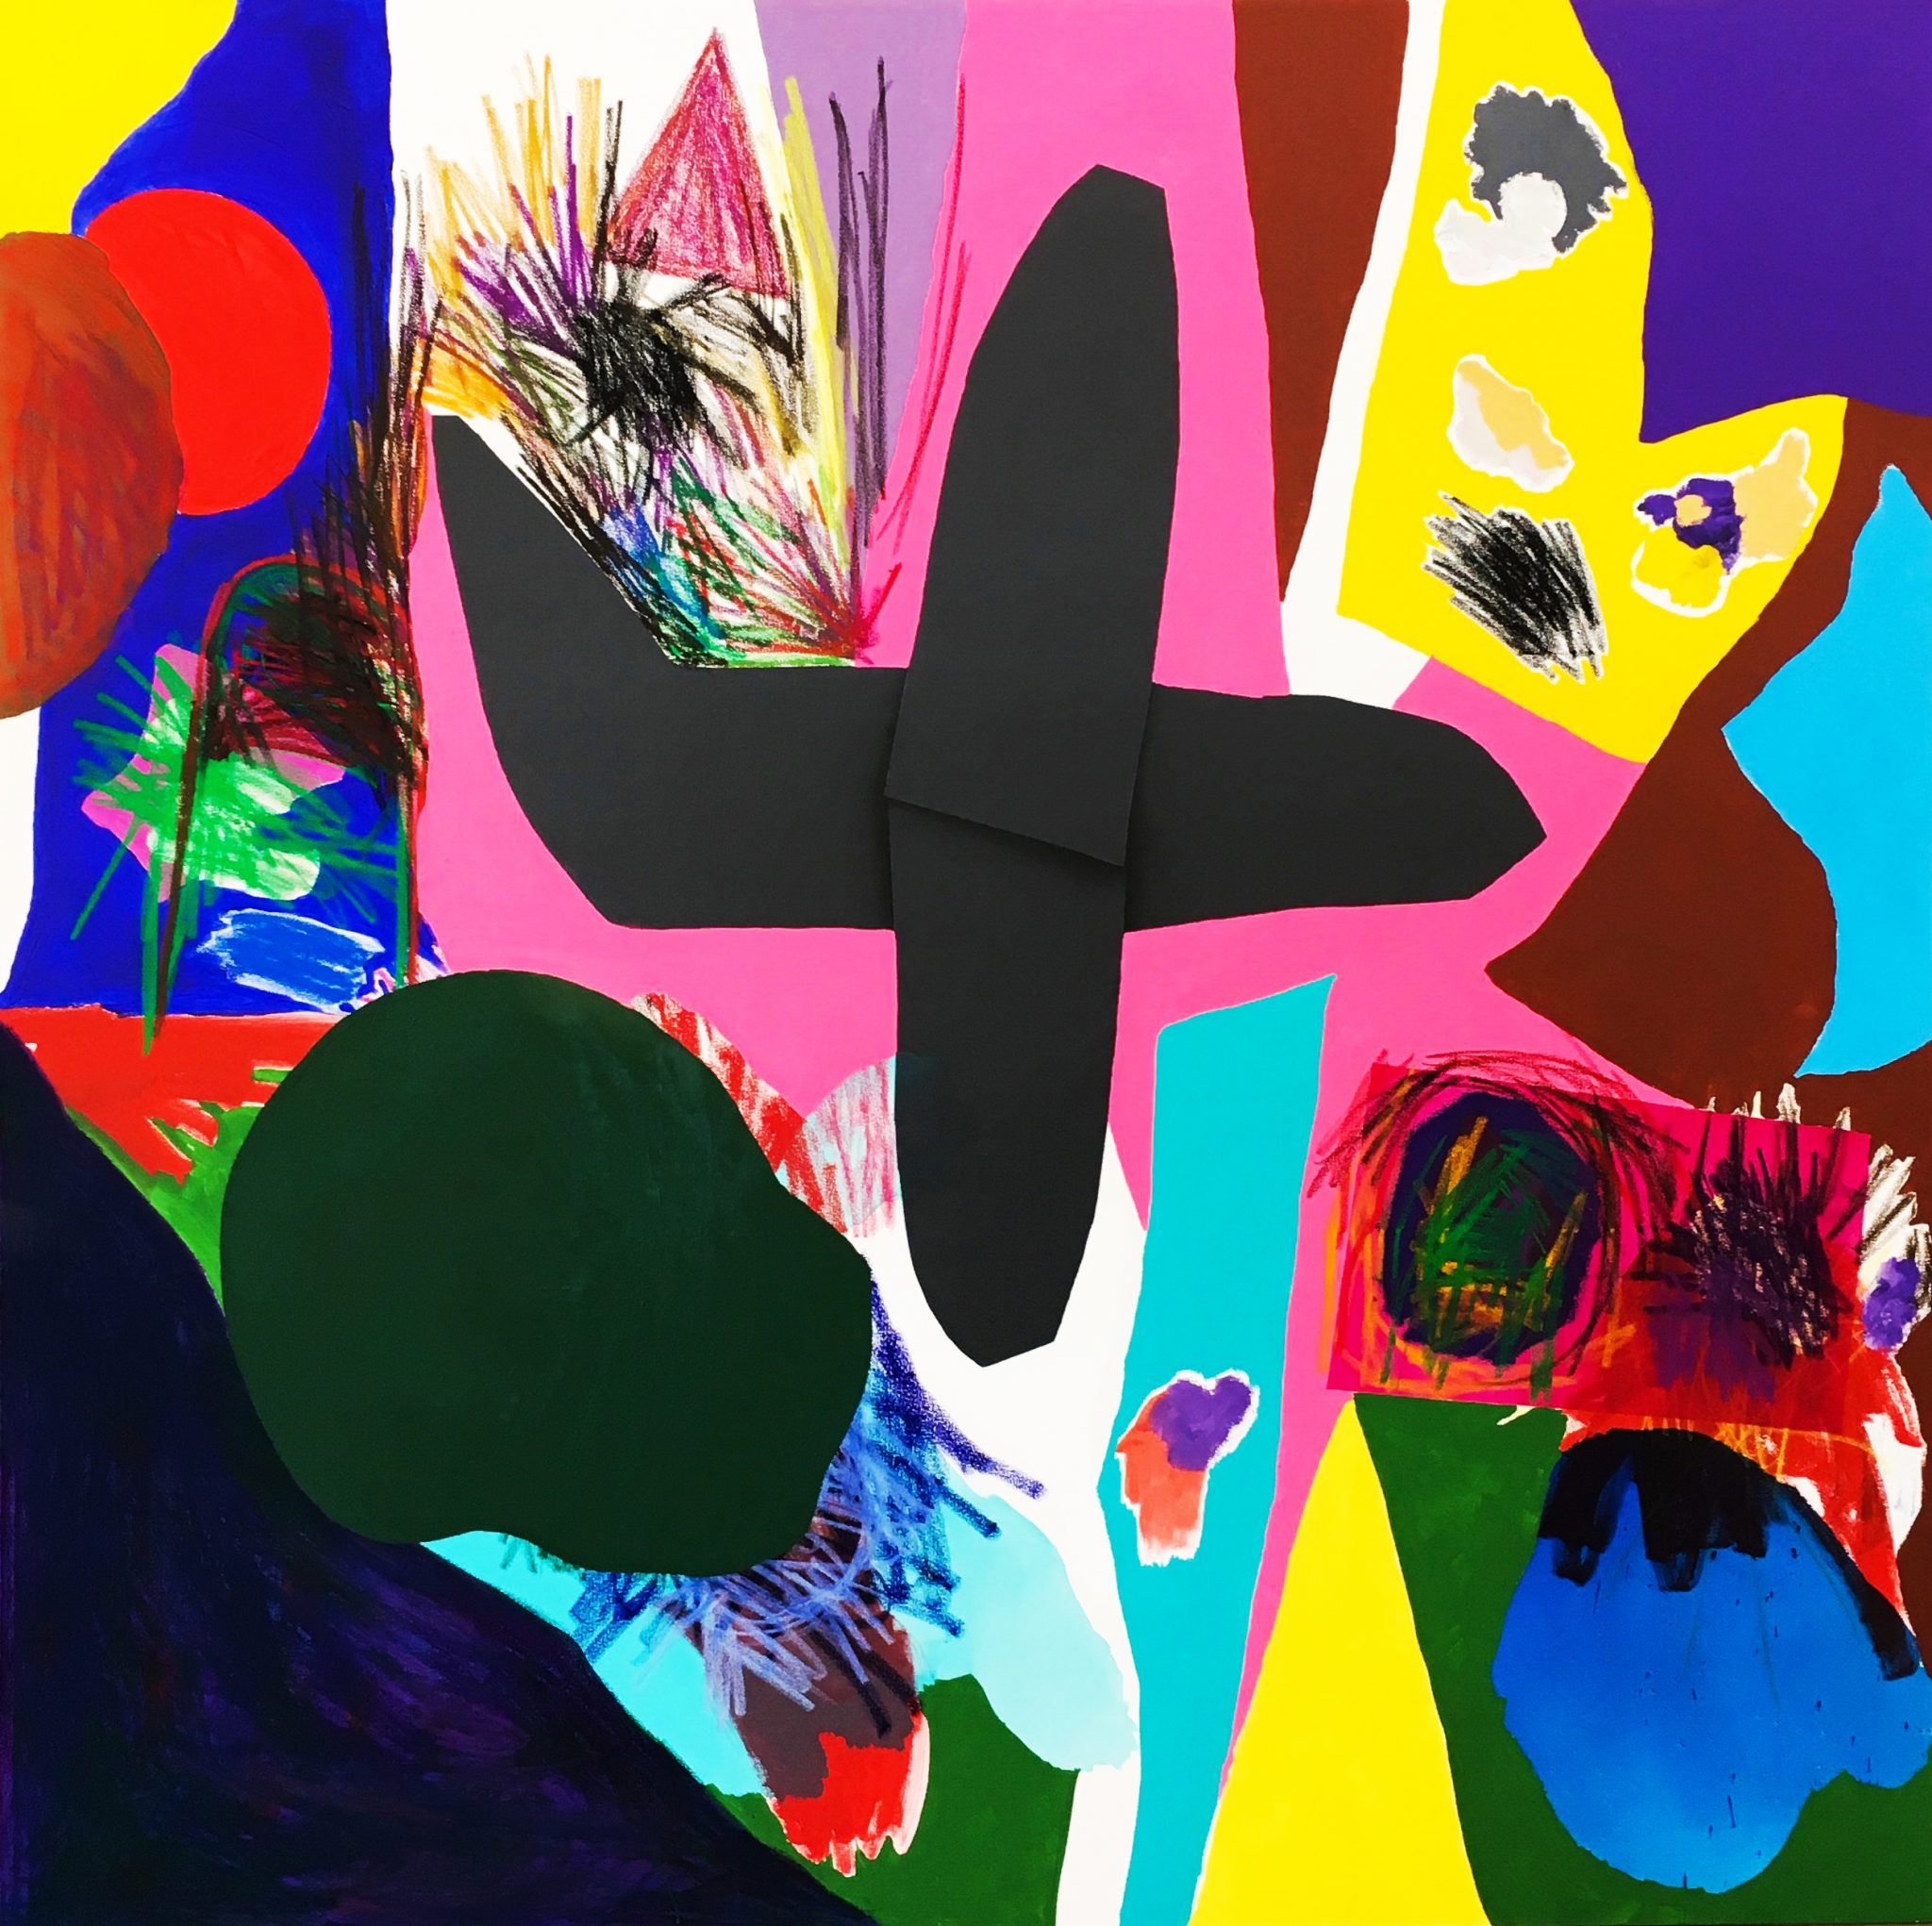 Jannis Varelas 2017 A plane over me